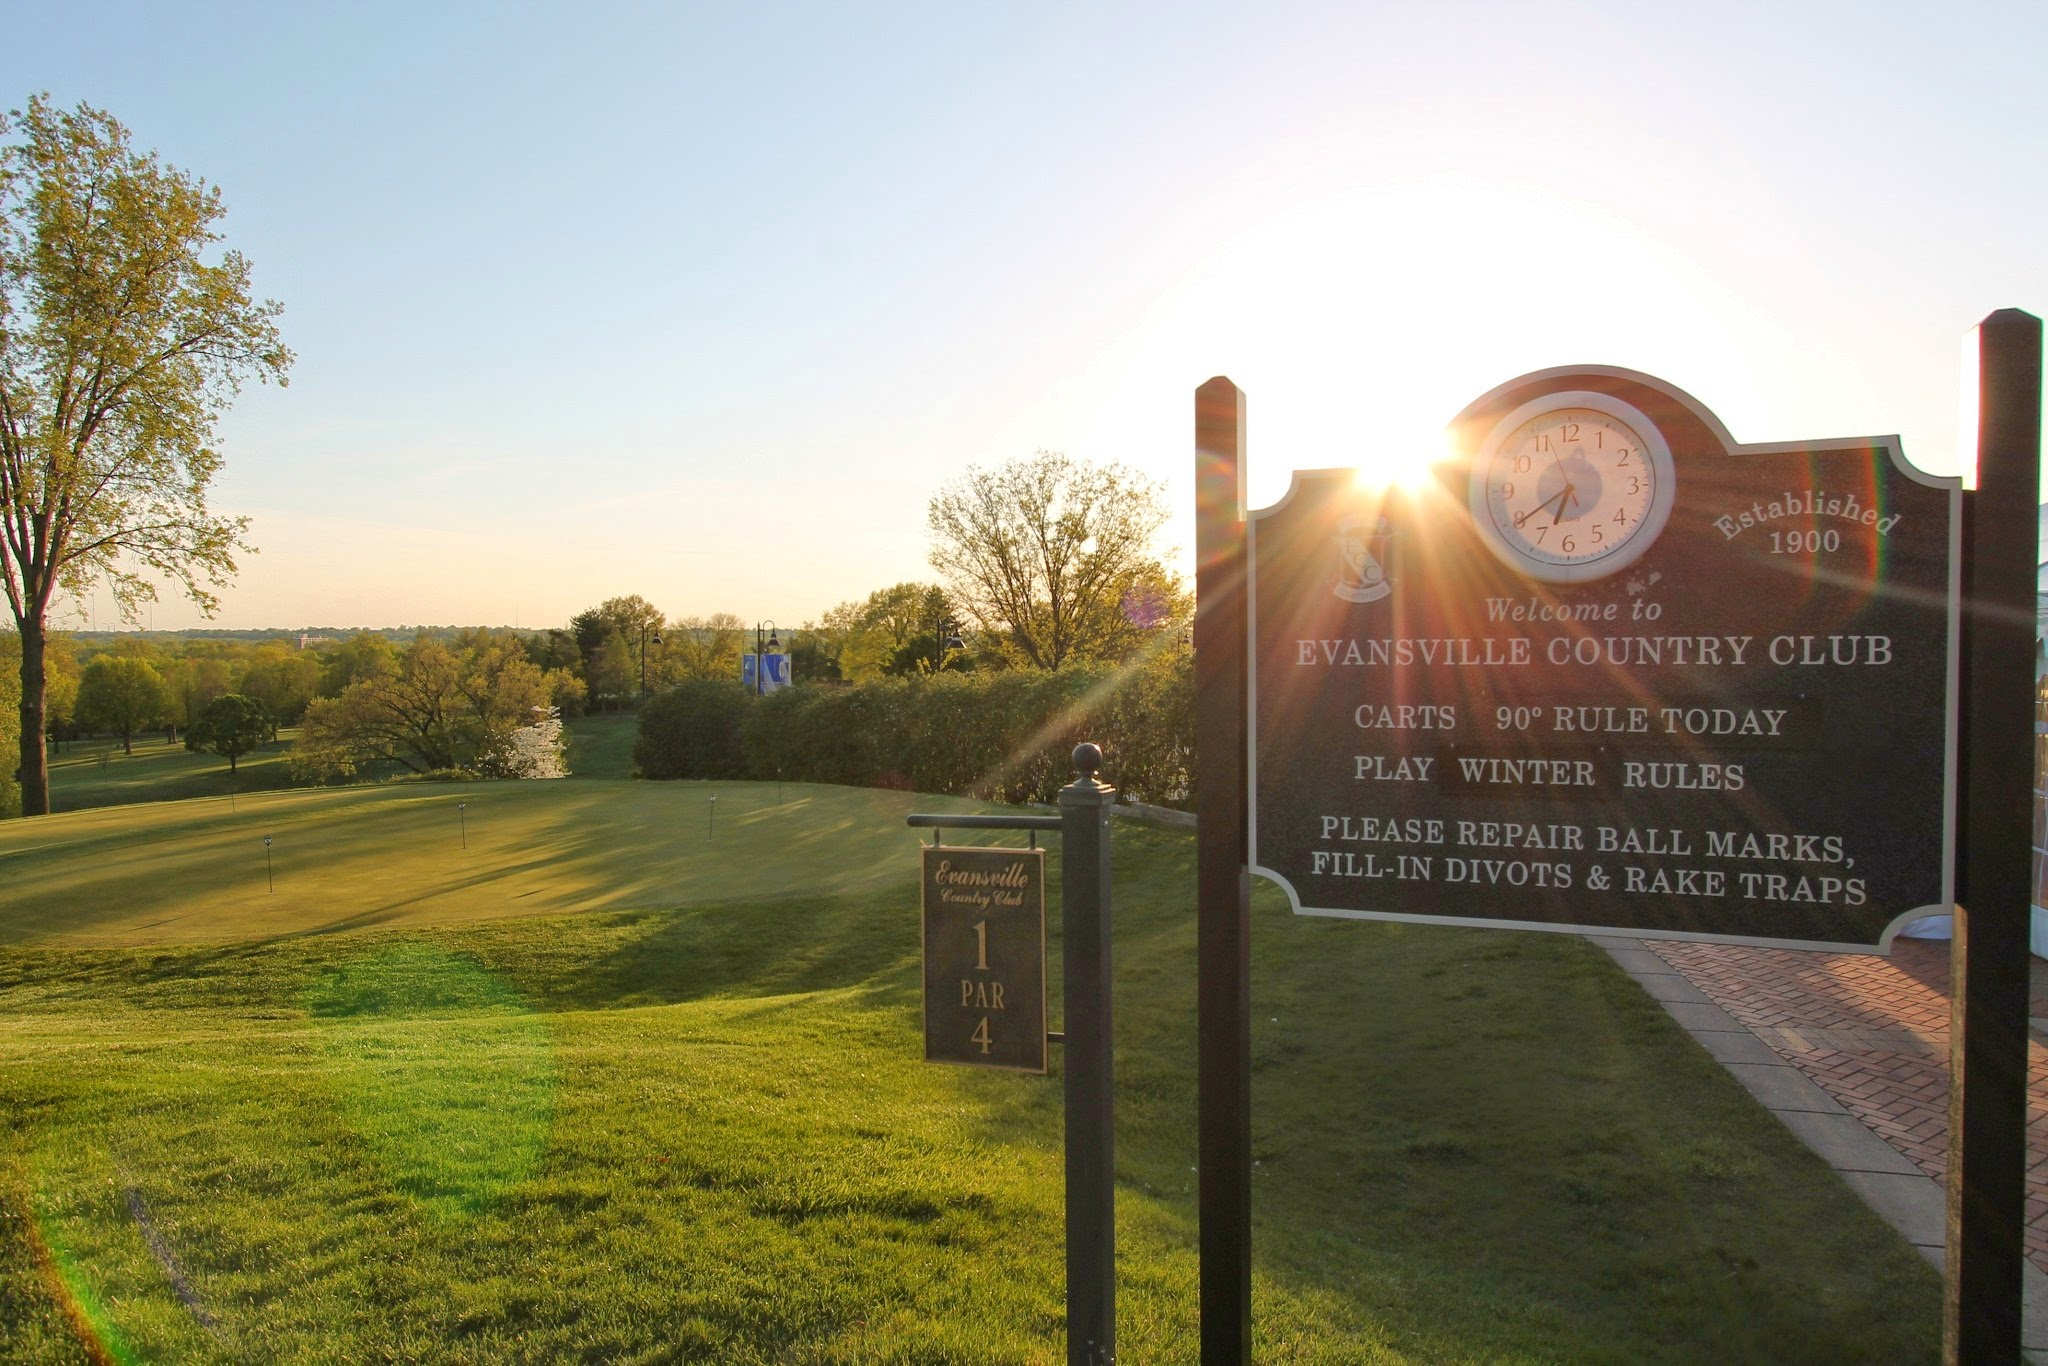 Evansville Country Club - Evansville City Golf Tournament